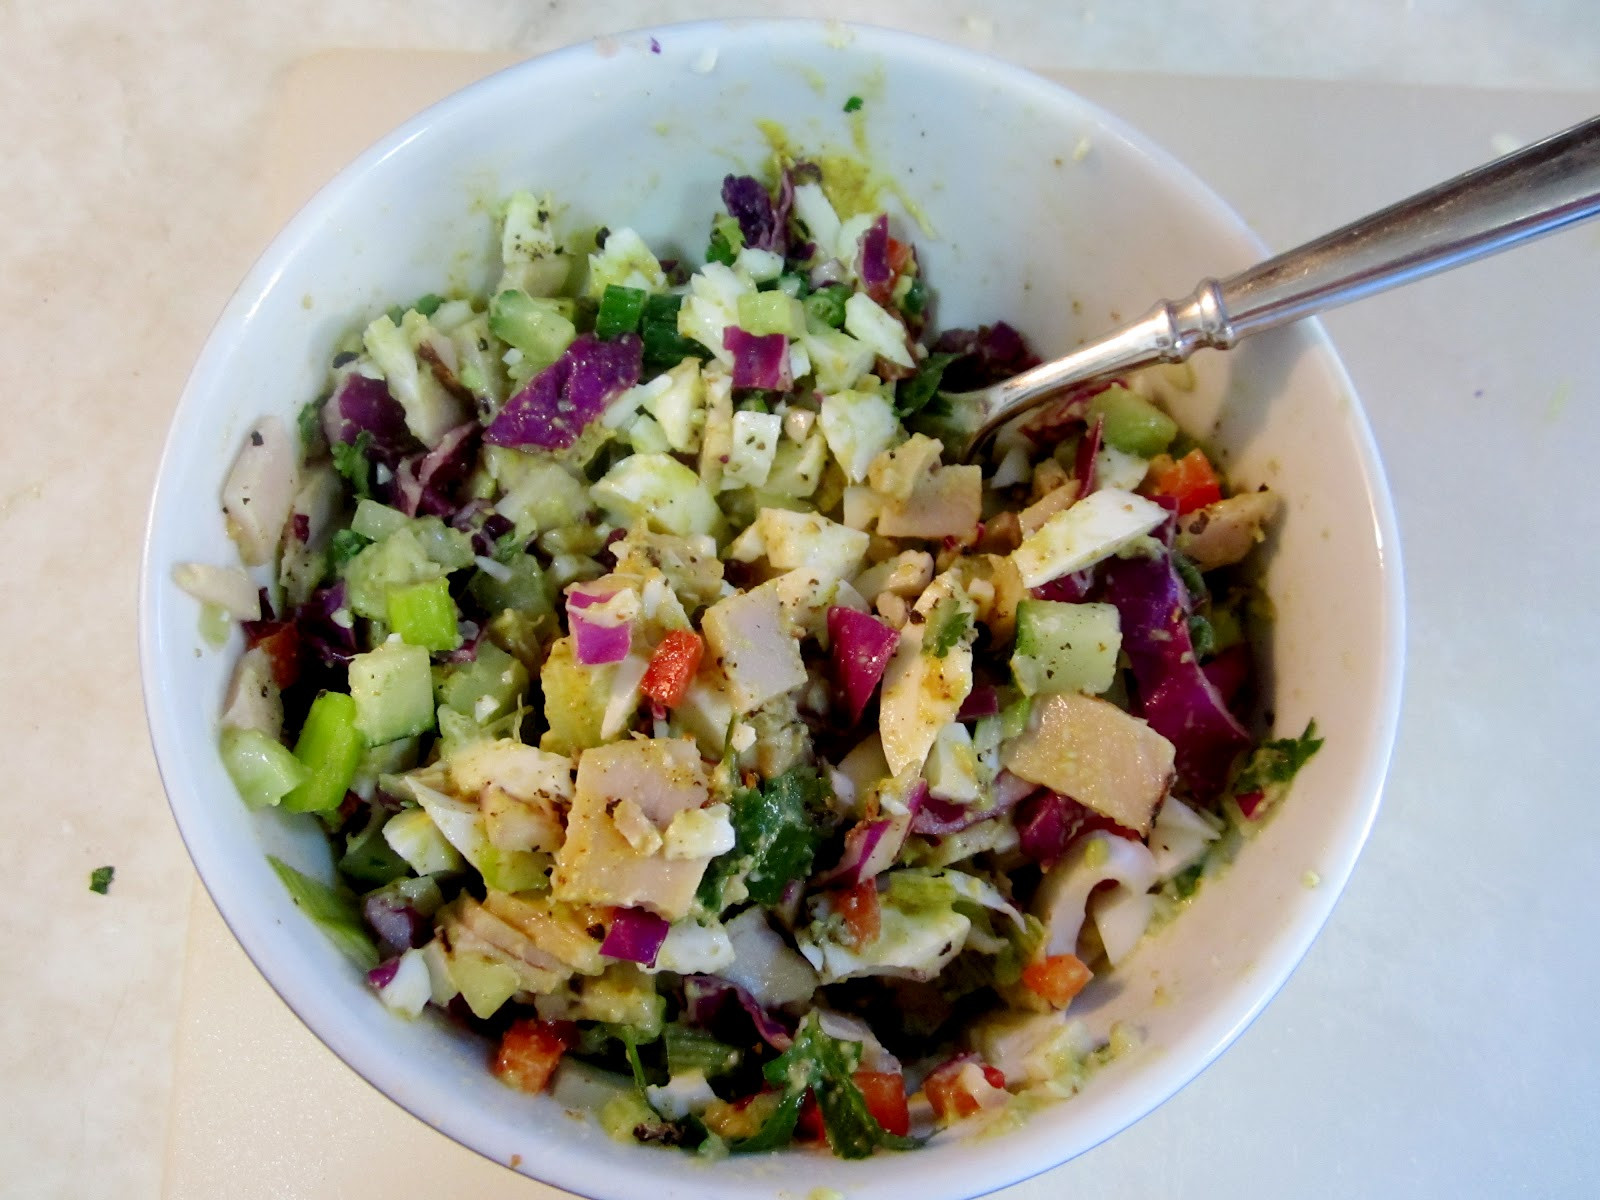 Paleo Chicken Salad  ThreeDiets eDinner Paleo Recipes to fit every t